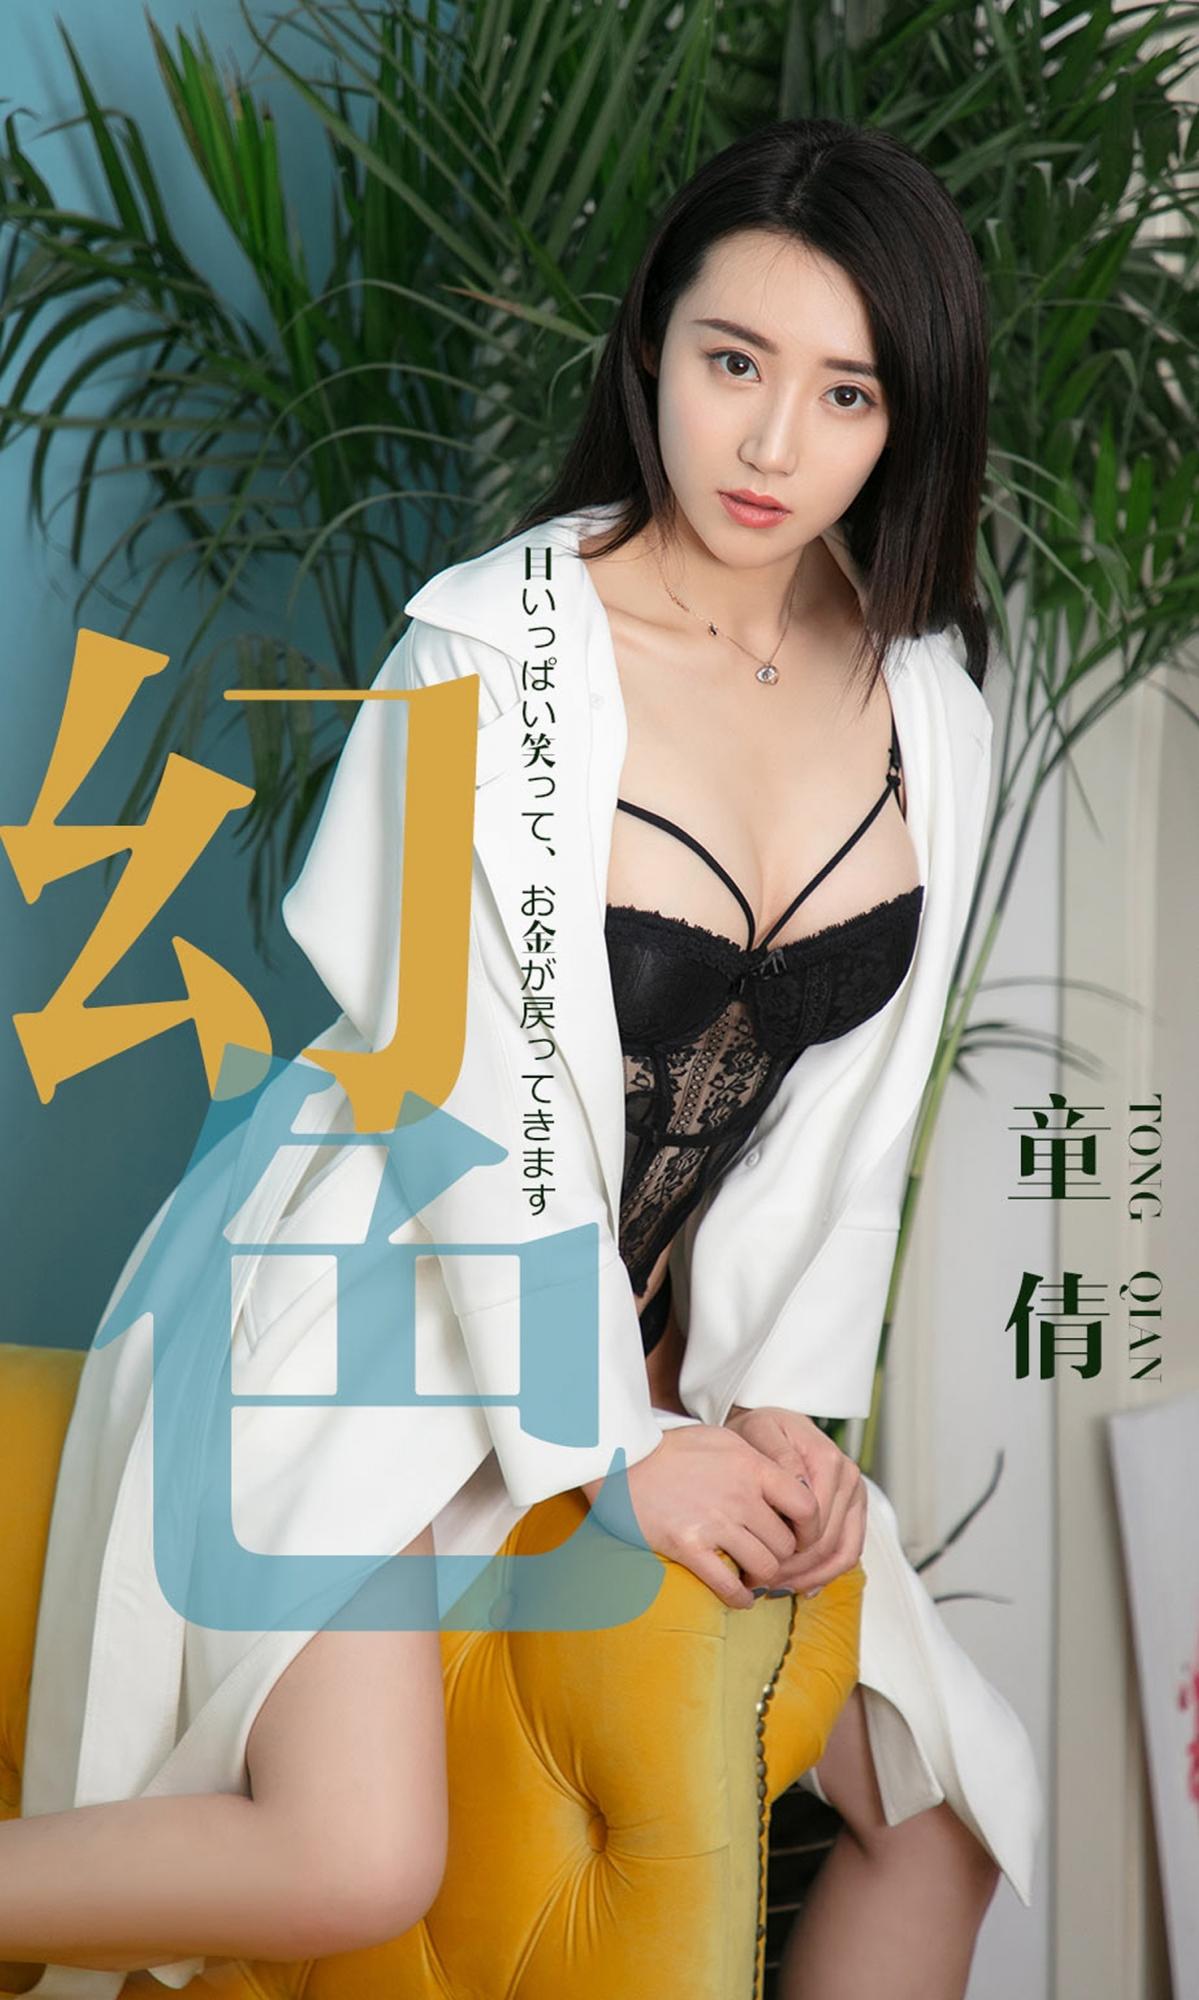 Ugirls尤果網 No.1441 童倩 幻色 画像31枚